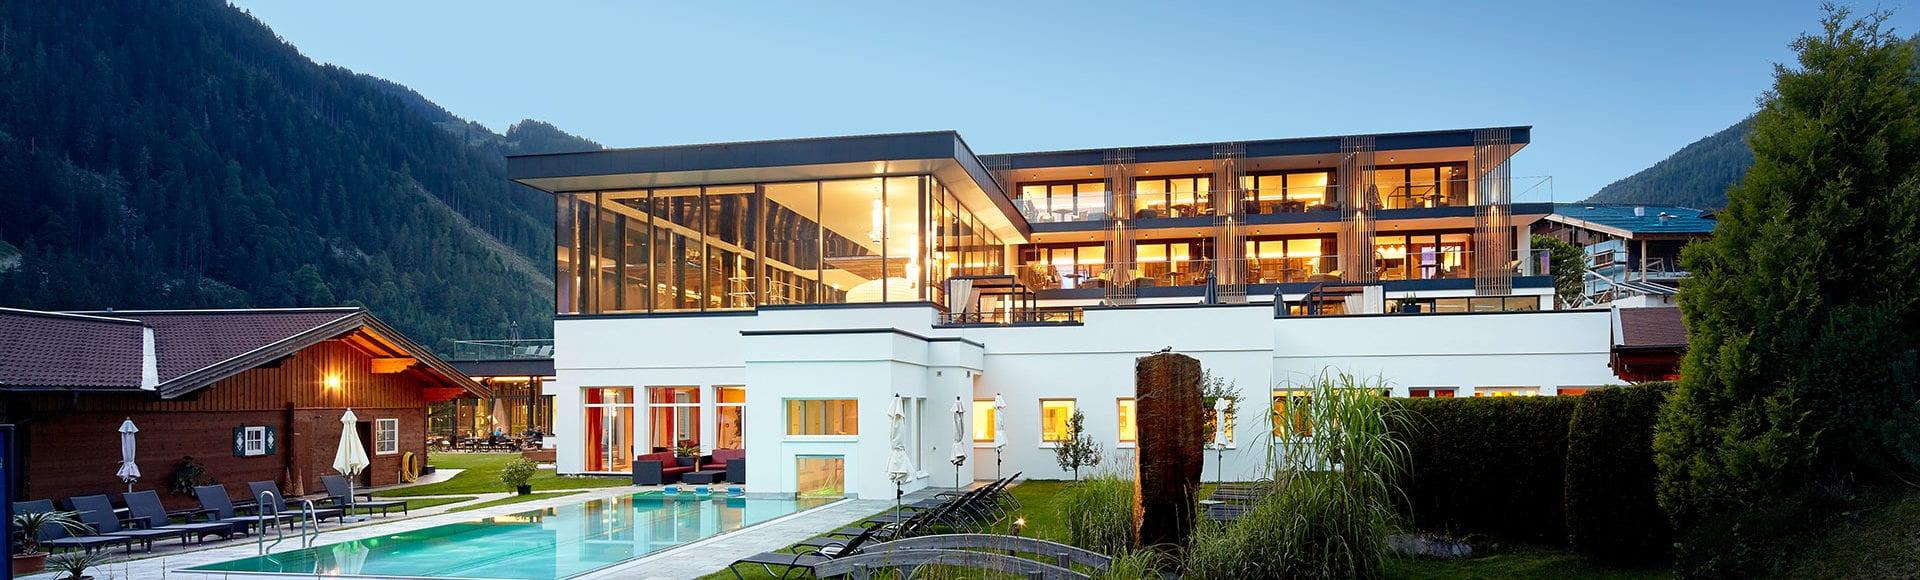 Prospekte - Lürzerhof Alpin Life Resort